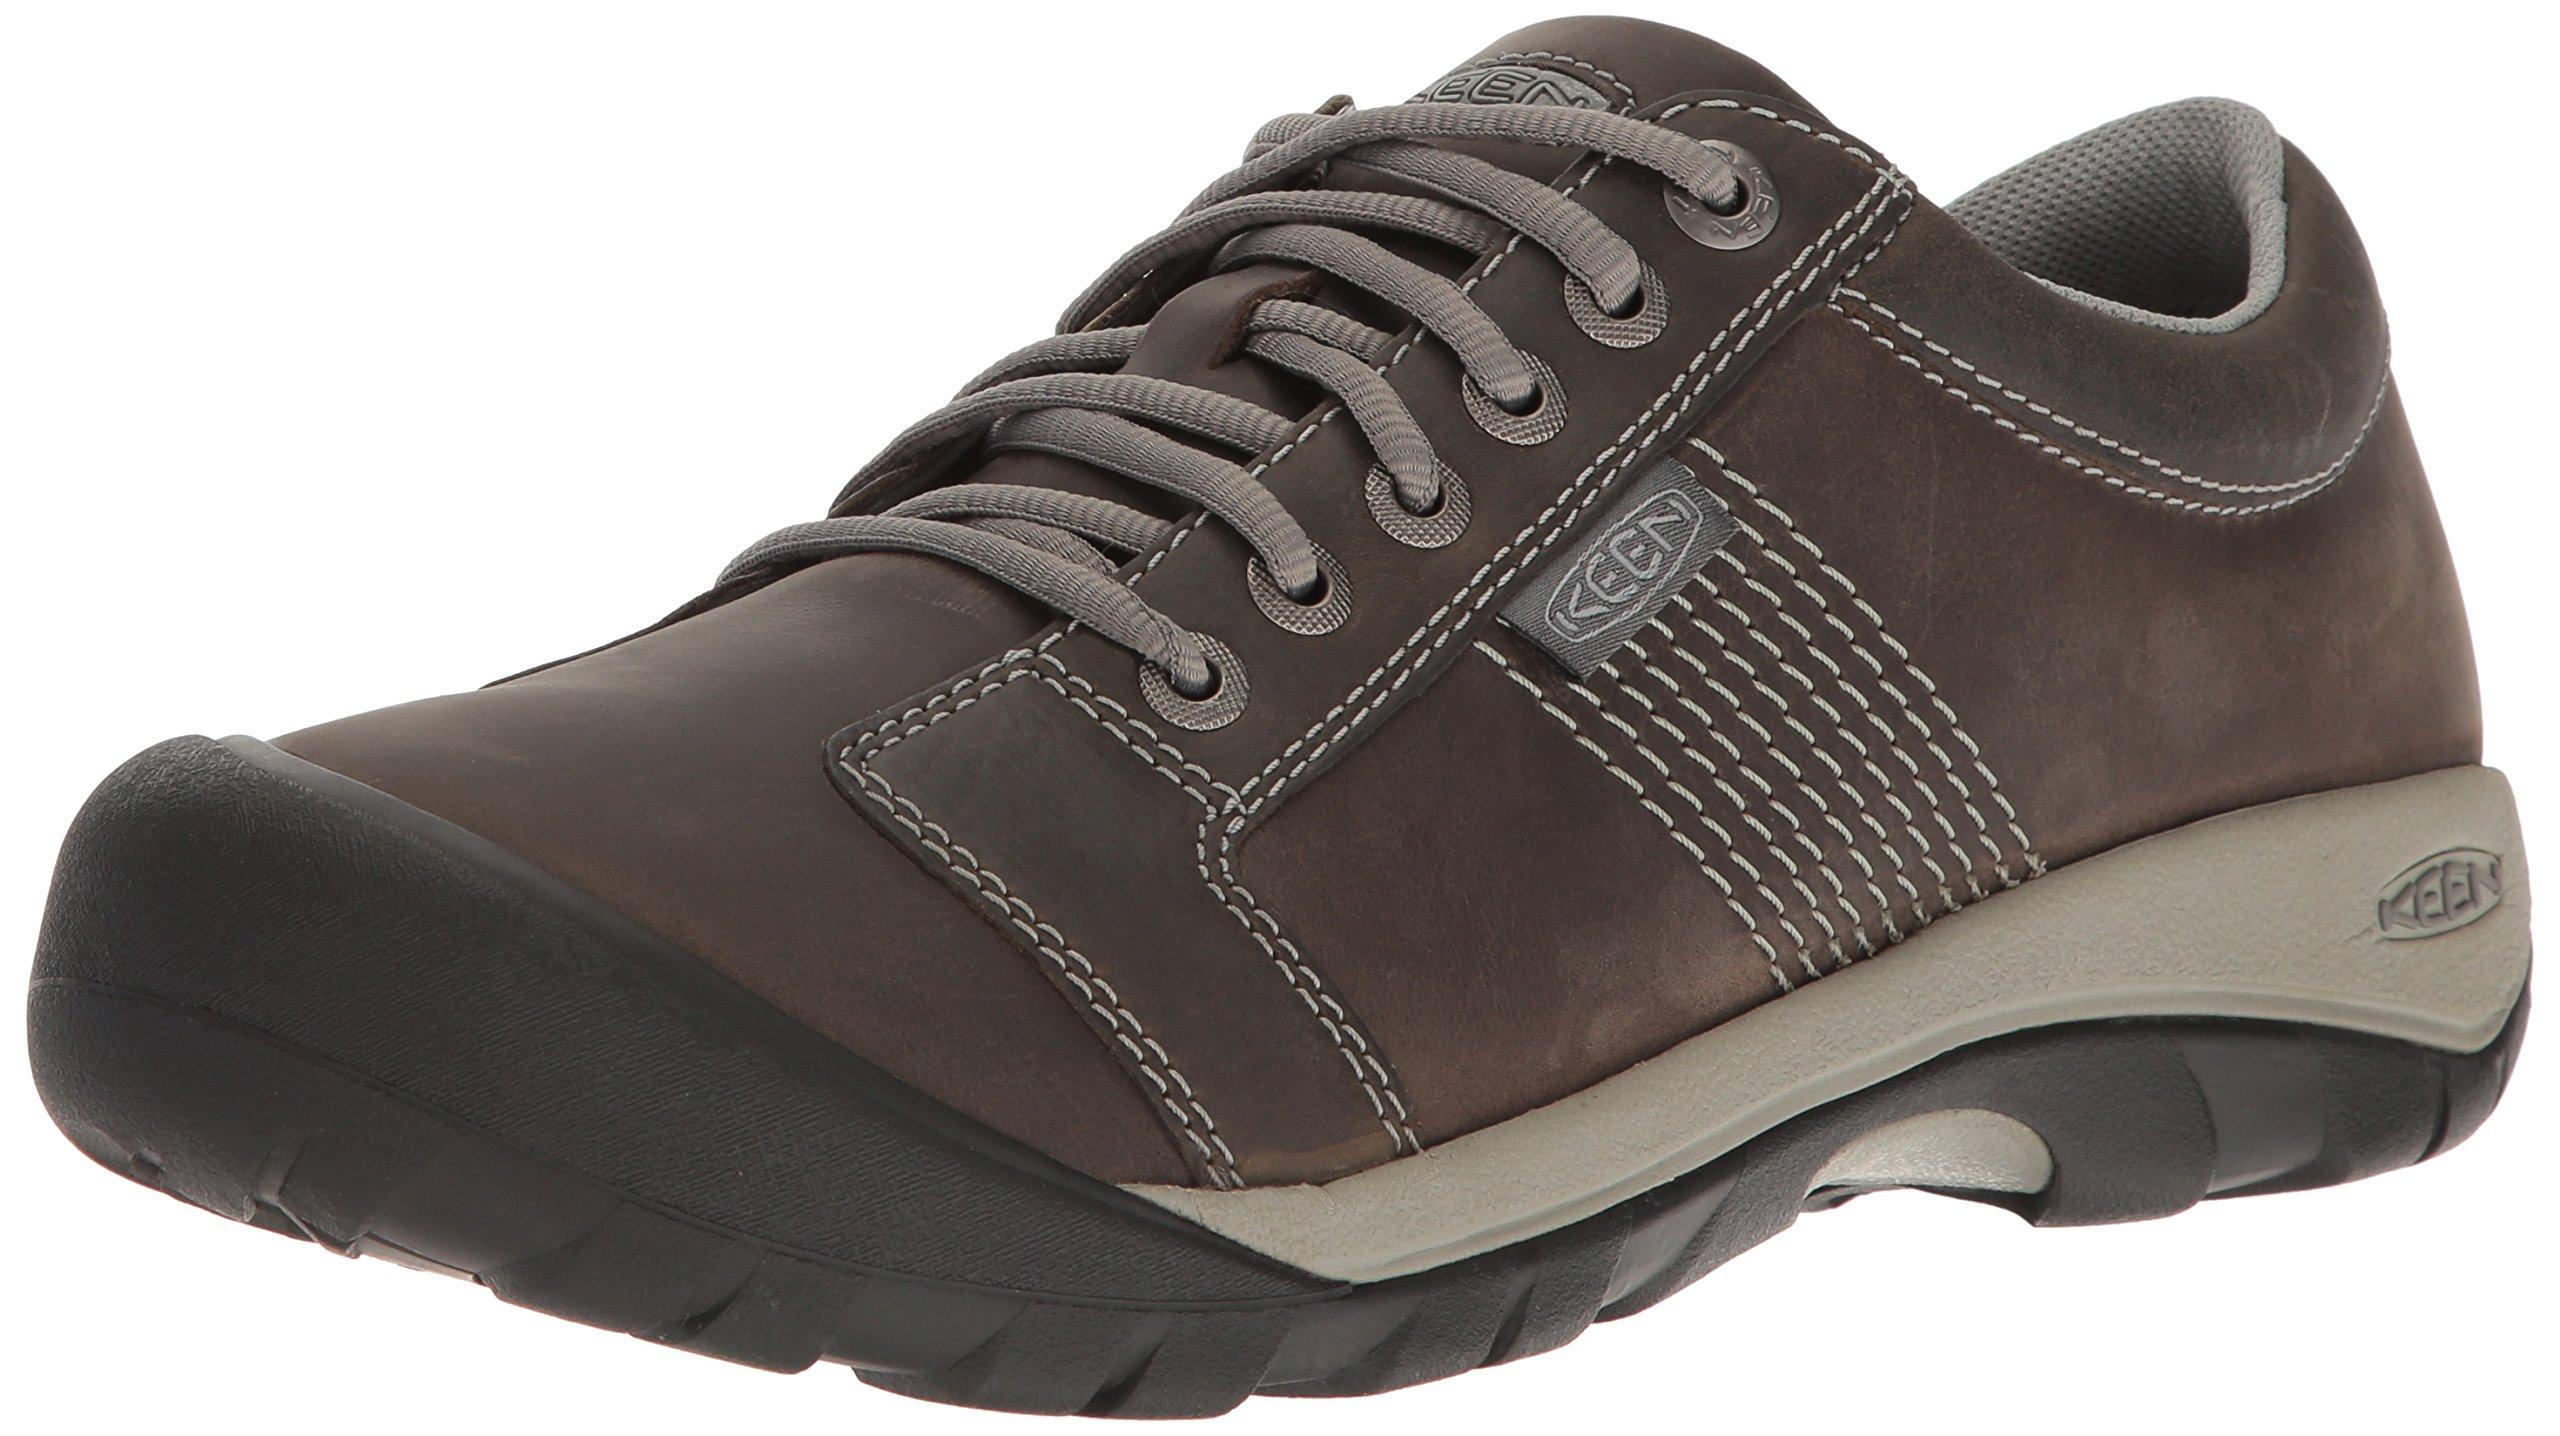 KEEN Men's Austin Hiking Shoe, Gargoyle/Neutral Gray, 8.5 M US